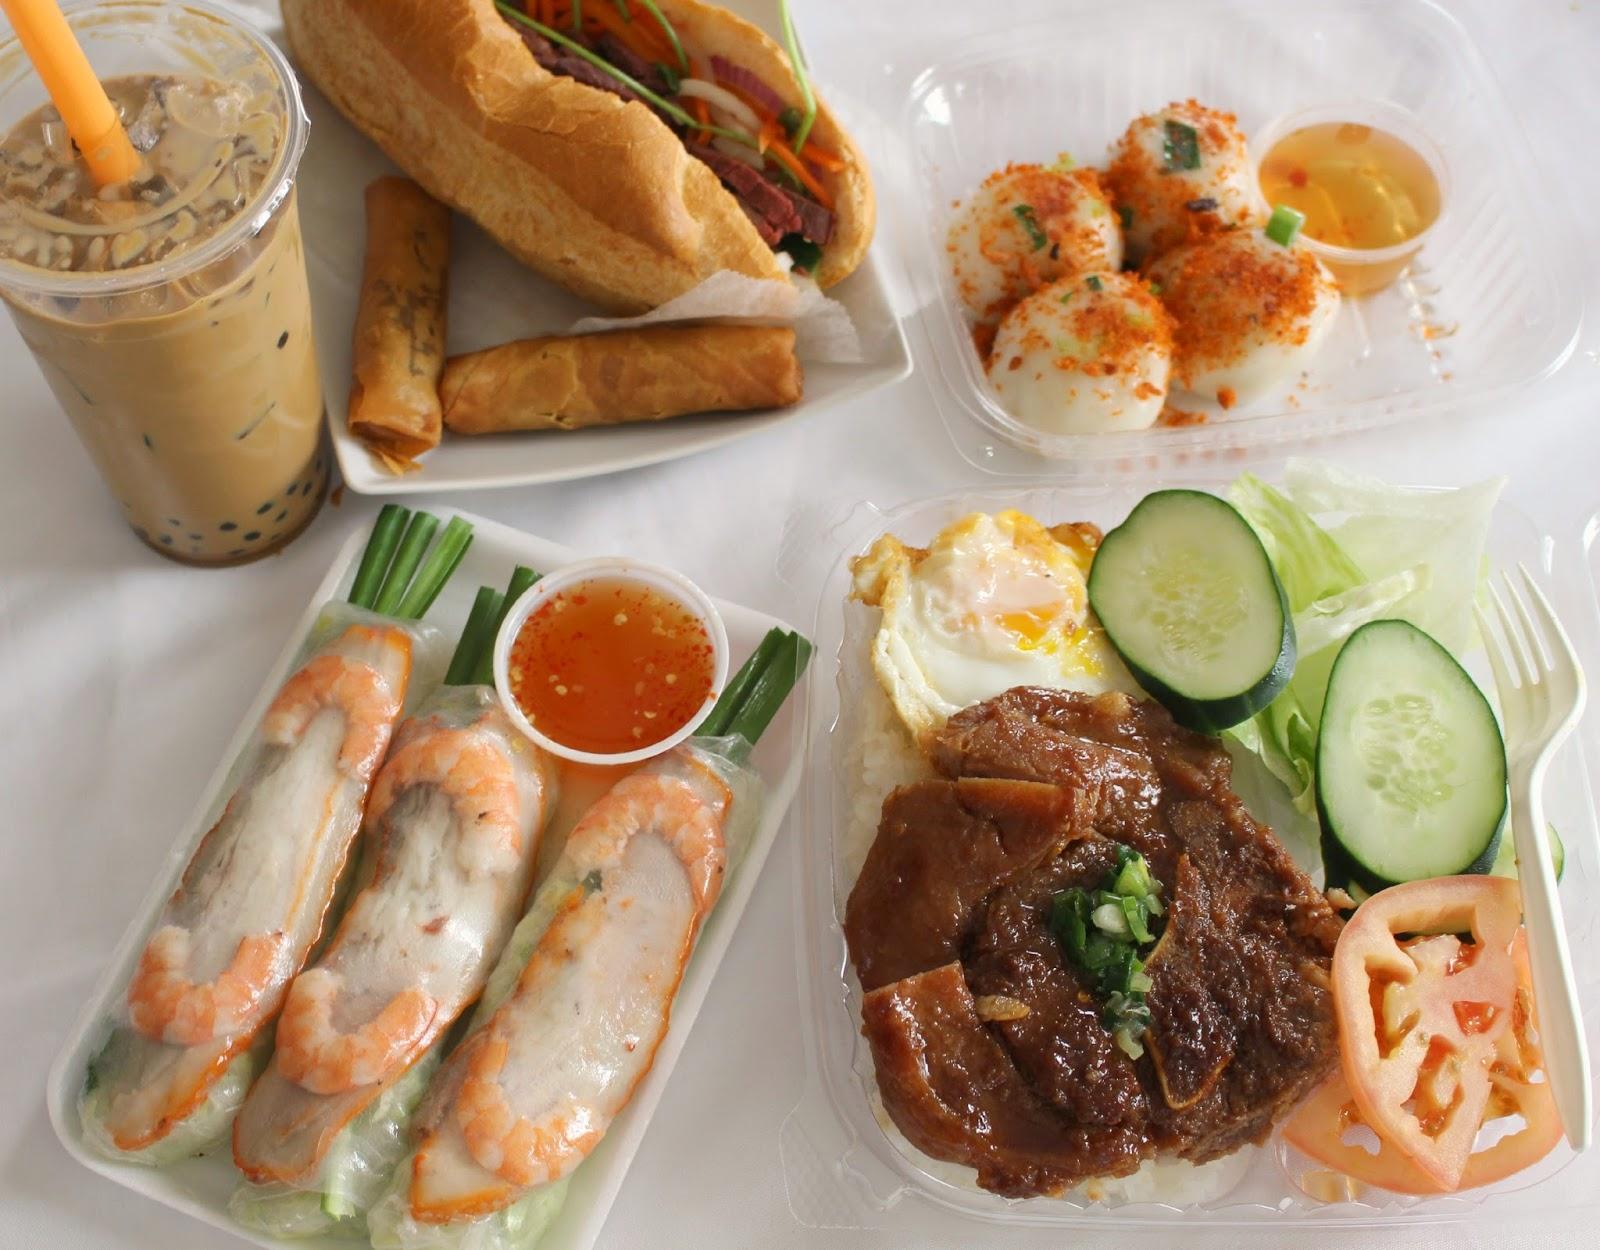 Mami Eggroll Banh Mi Sandwiches And More At Hong Cuc In